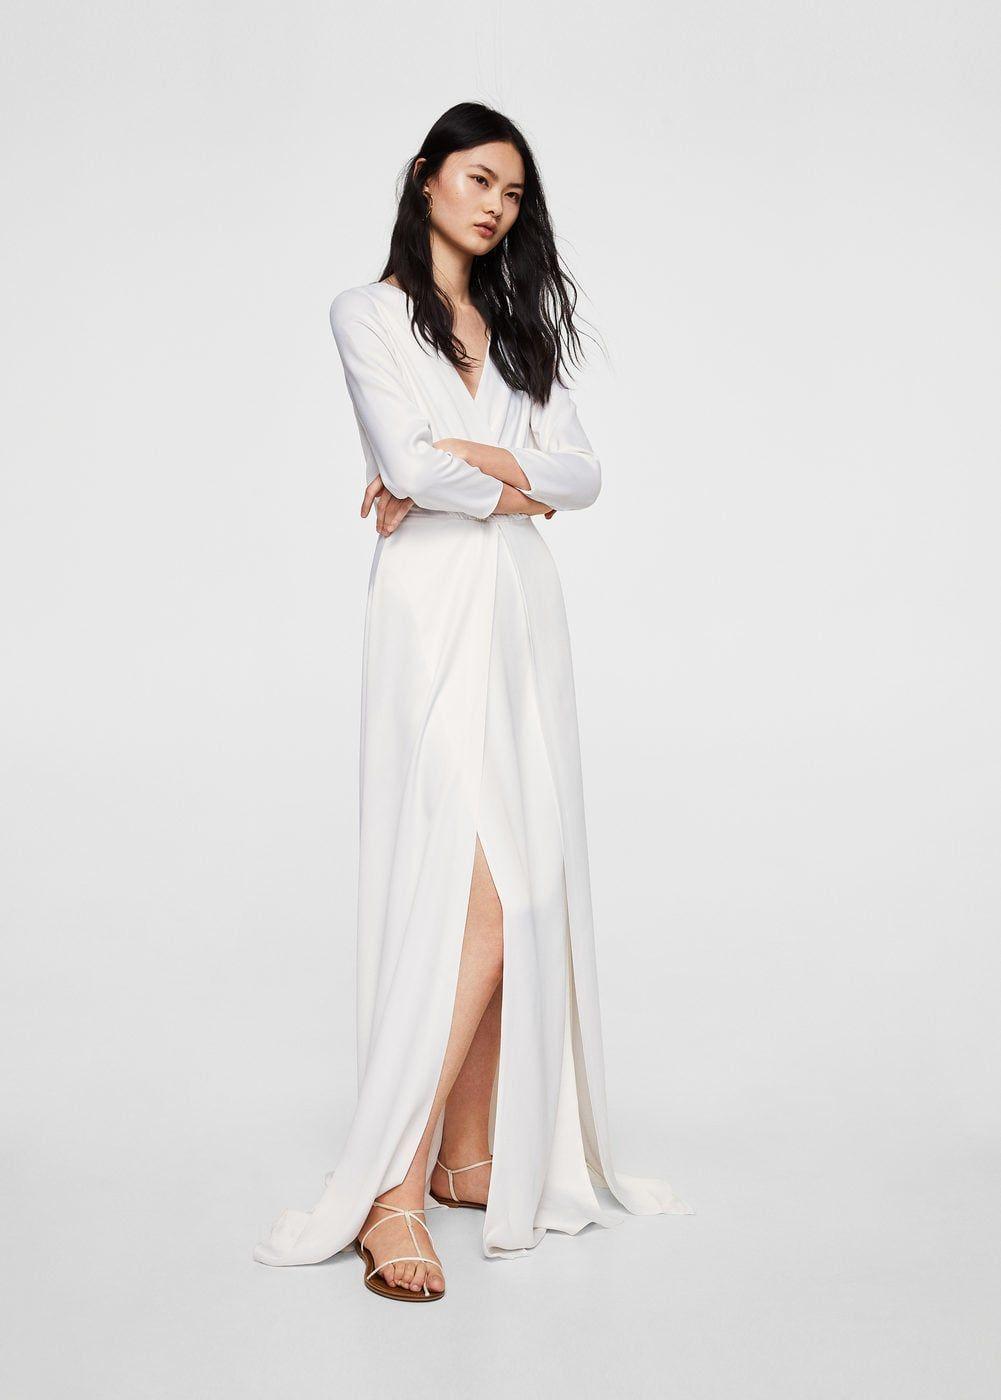 7592cb79e6b Φόρεμα ντεκολτέ κρουαζέ - Γυναίκα, 2019 | φορεματα | Φορέματα ...